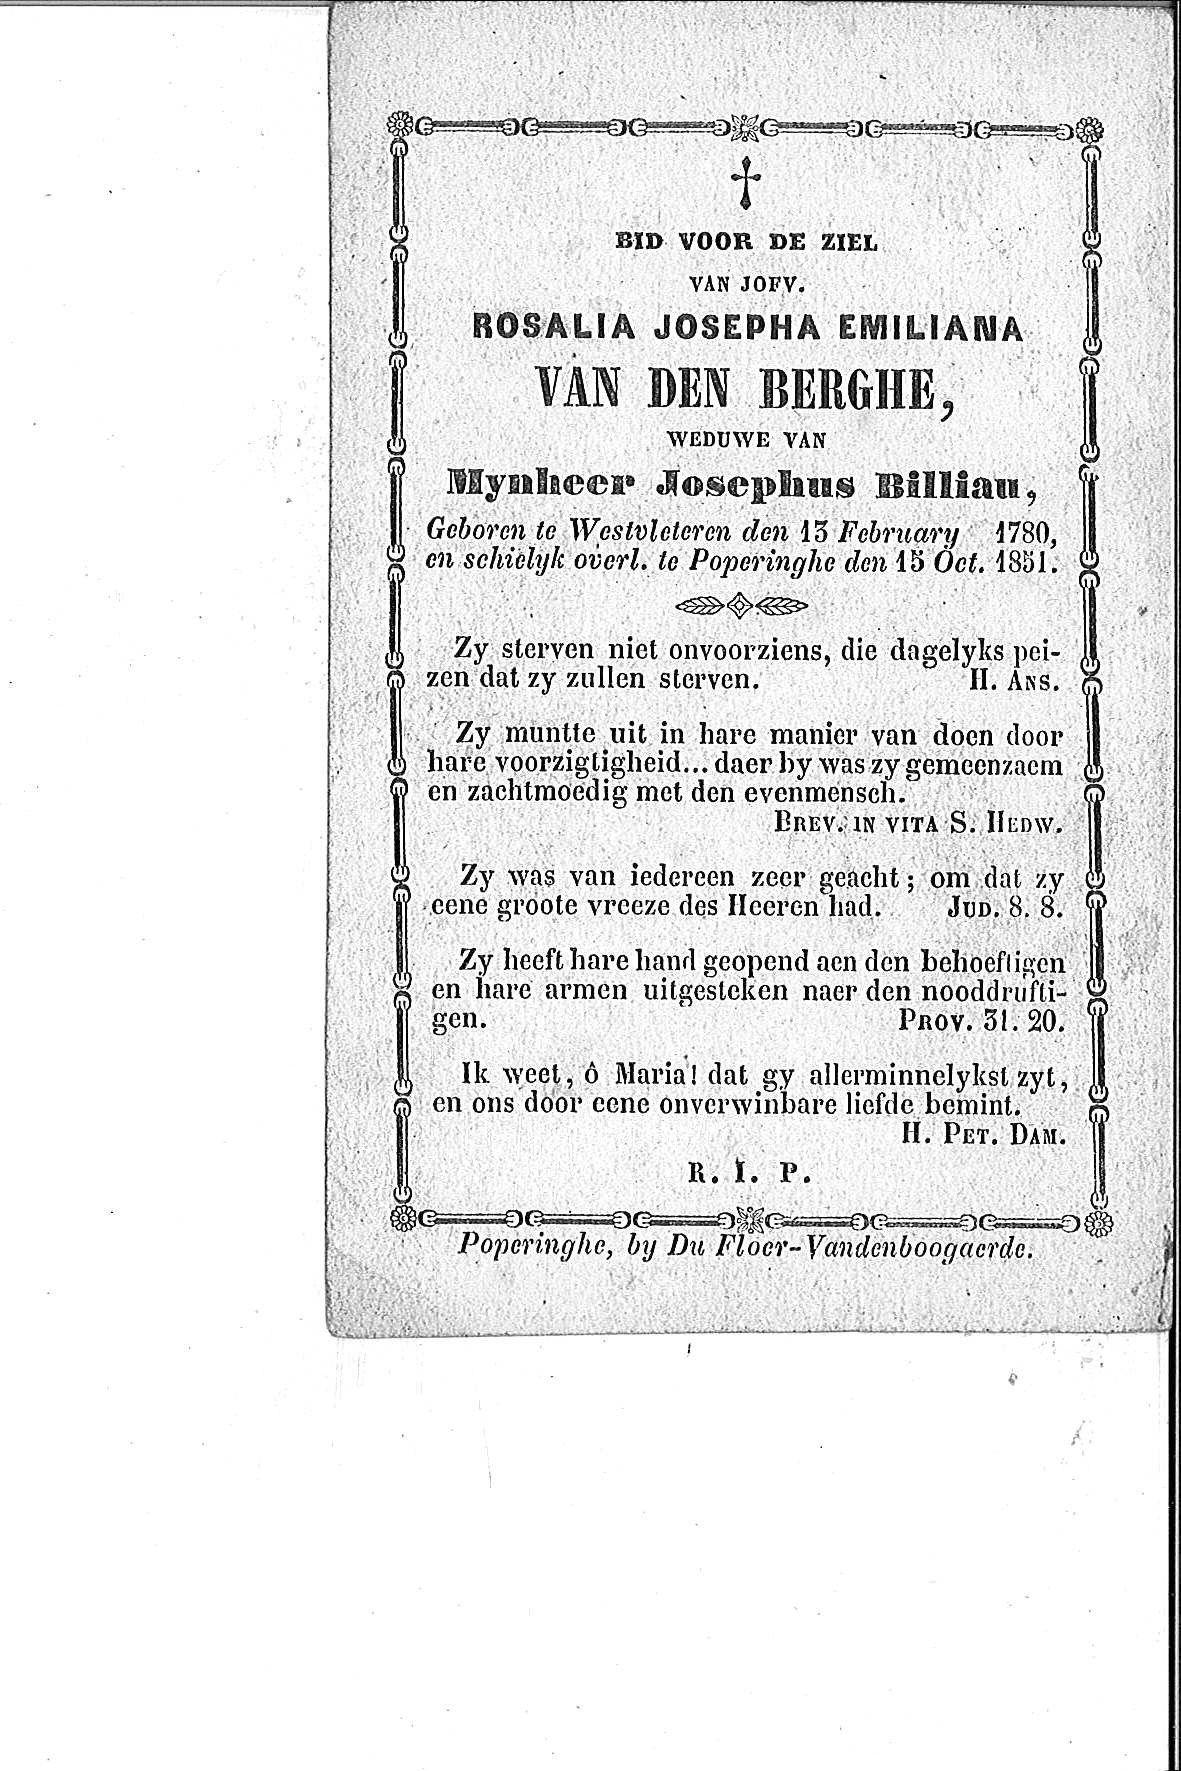 Rosalia_Josepha(1851)20150805121003_00144.jpg